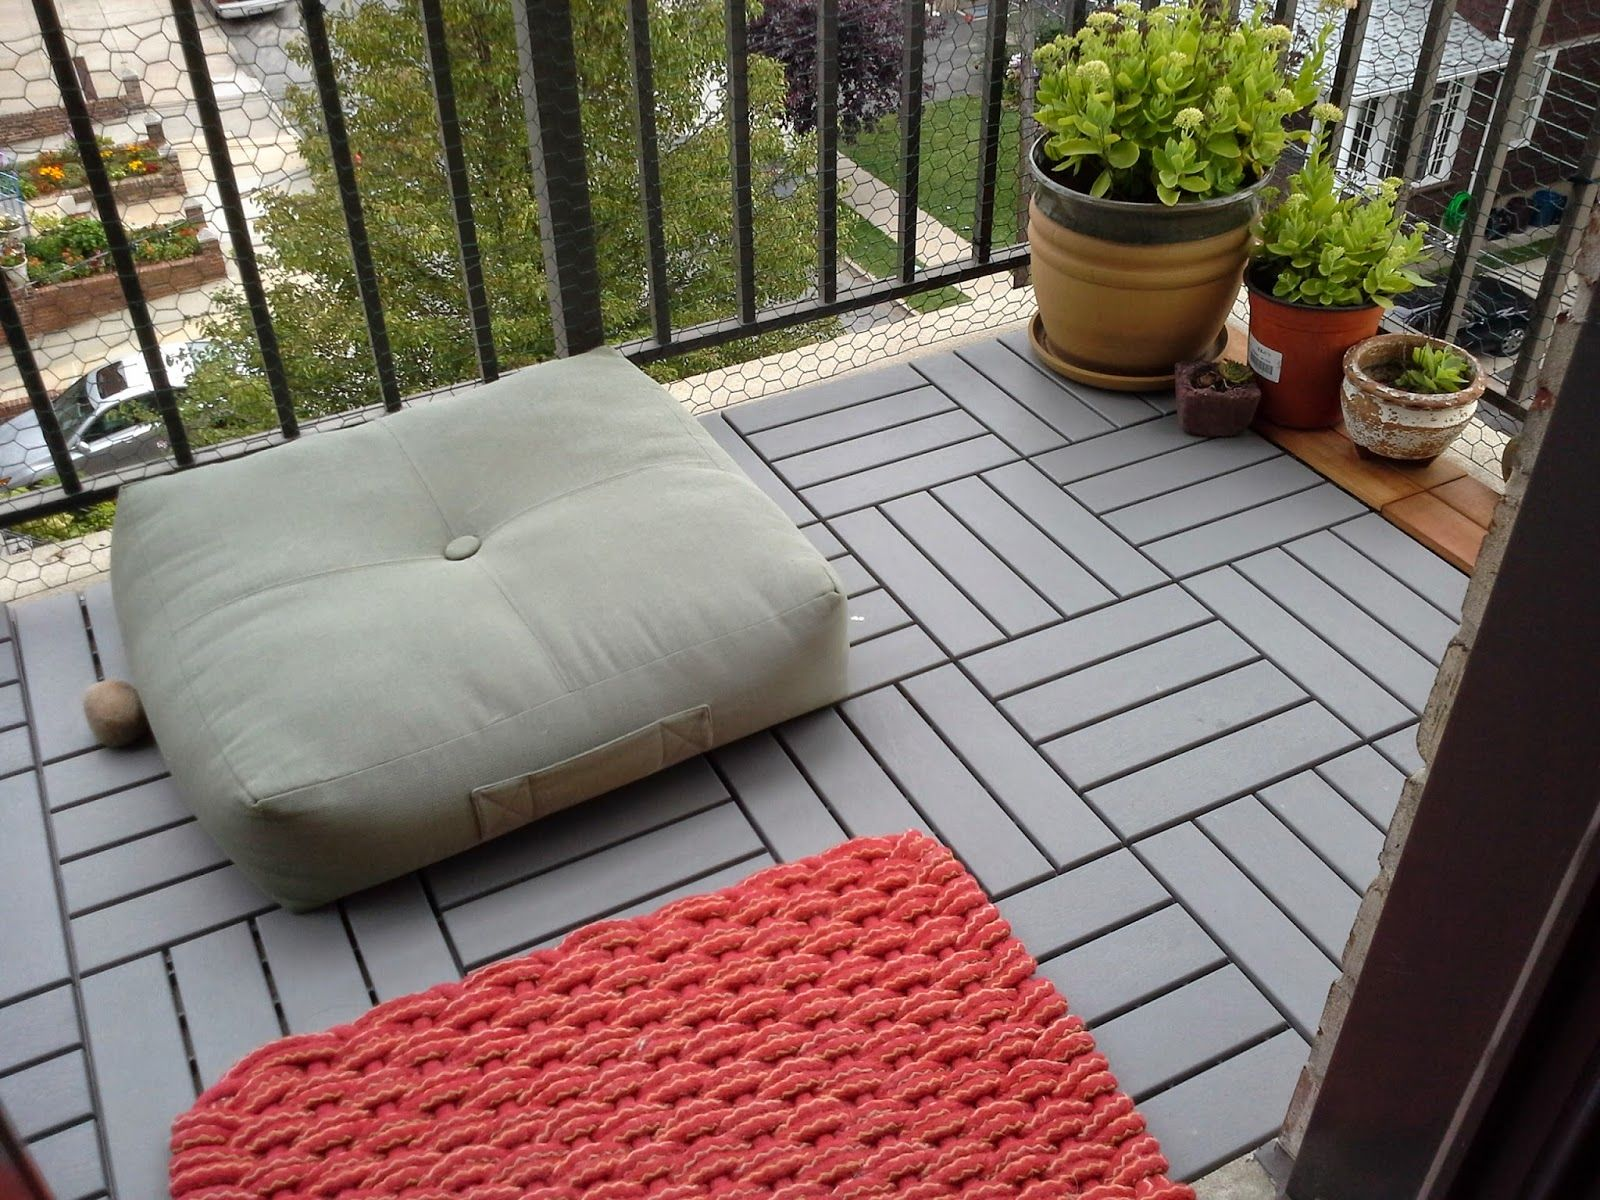 Outdoor floor decking tiles images home flooring design decor your outdoor patio using interlocking deck tiles cool ikea decor your outdoor patio using interlocking dailygadgetfo Gallery